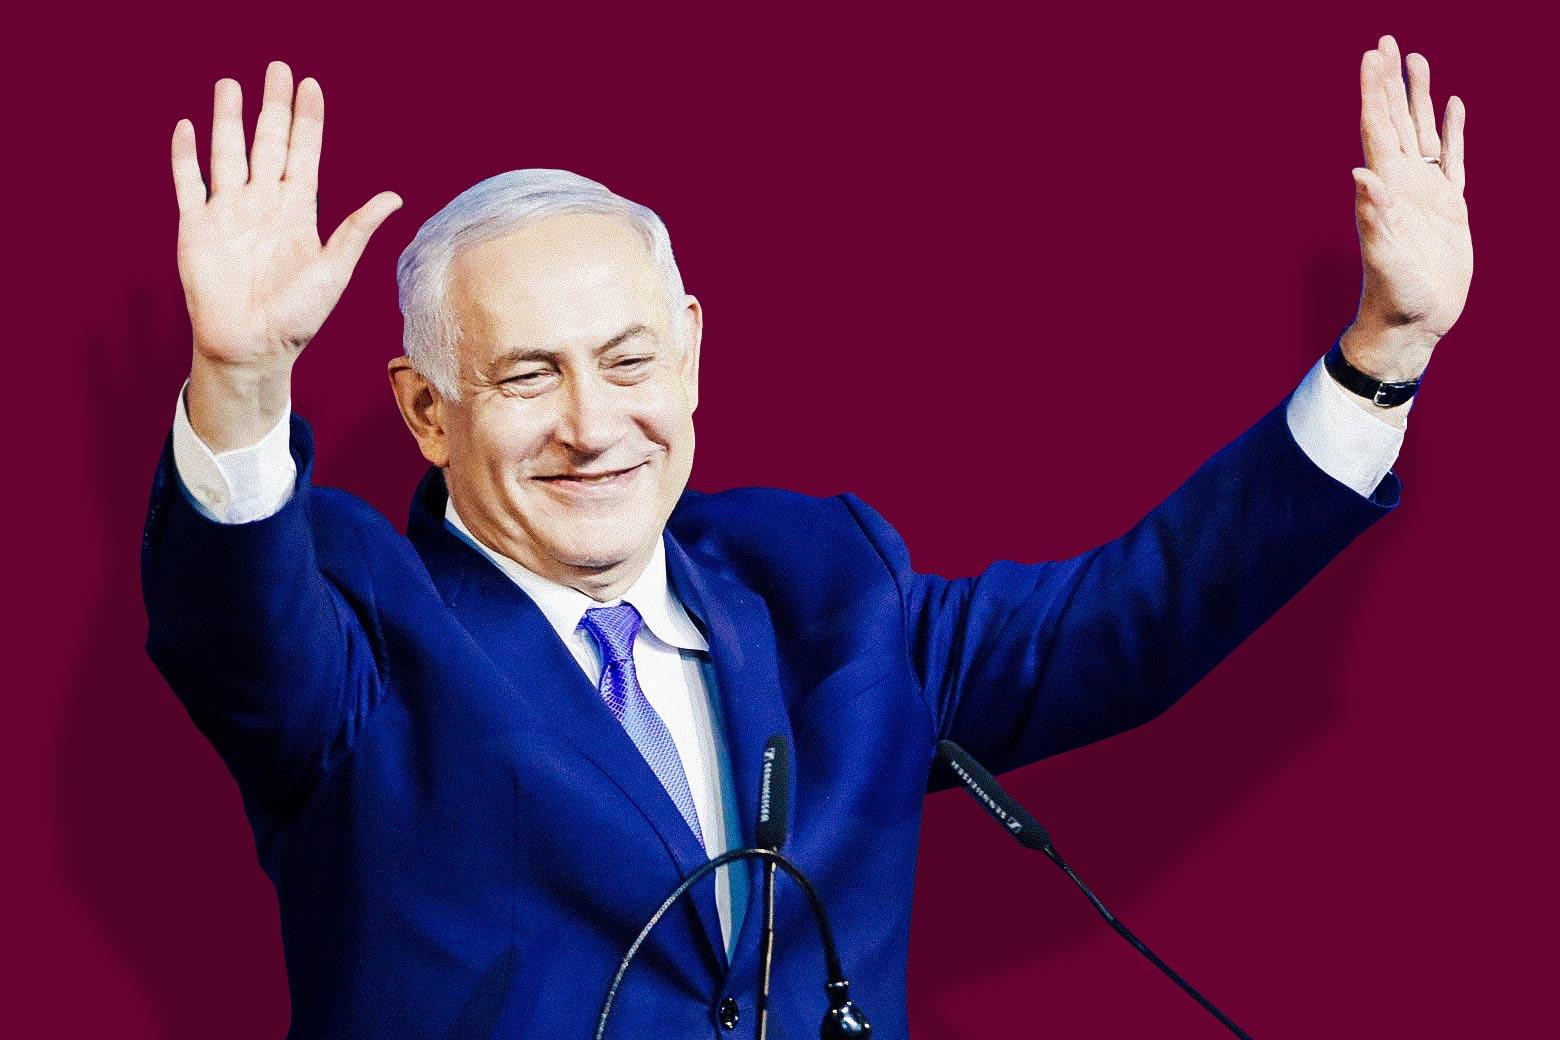 Israeli Prime Minister Benjamin Netanyahu with arms raised